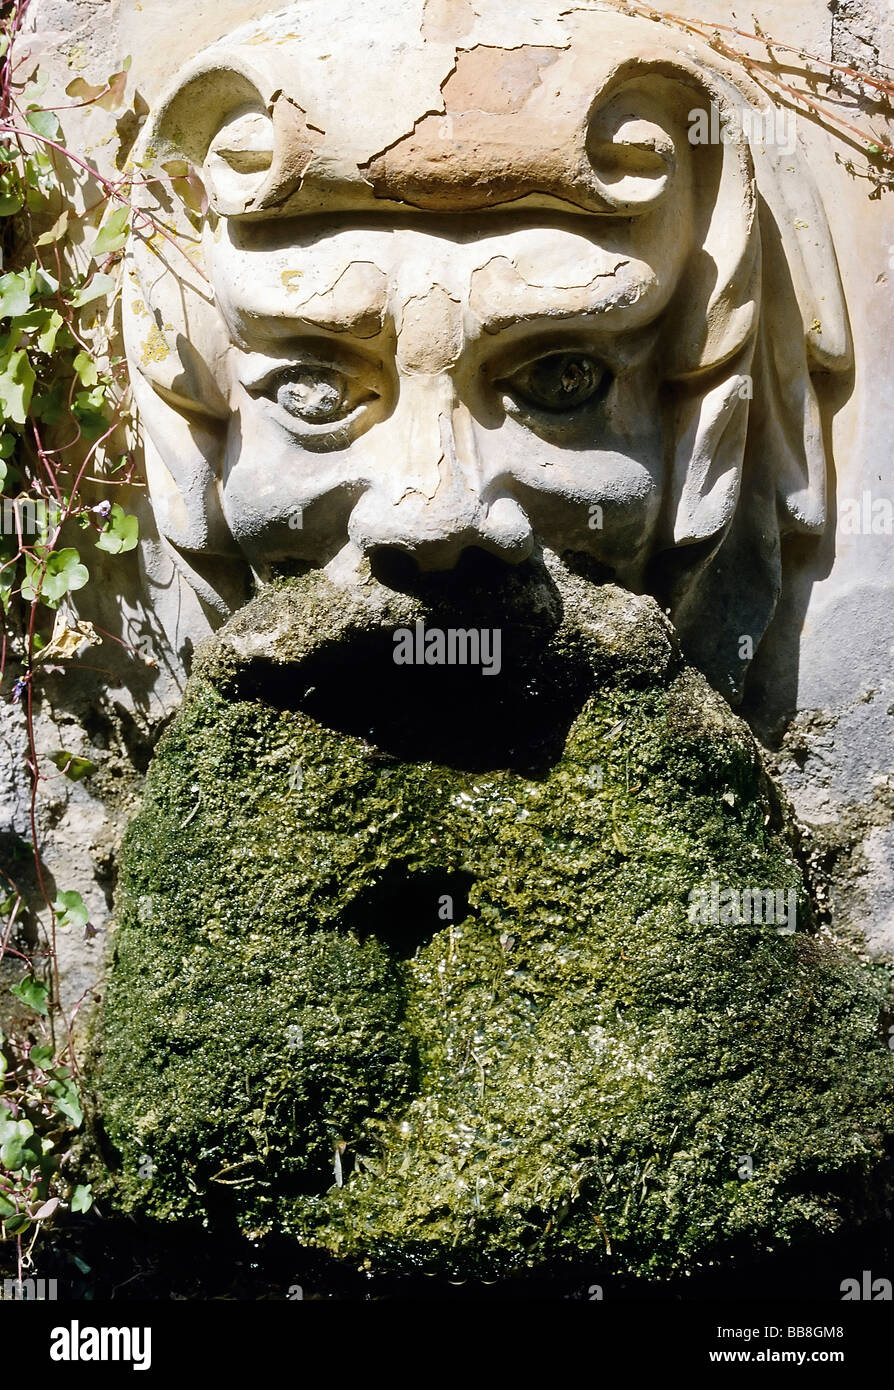 Incredible La Raixa Gardens Water Spout Face With A Beard Of Moss Near Short Hairstyles For Black Women Fulllsitofus